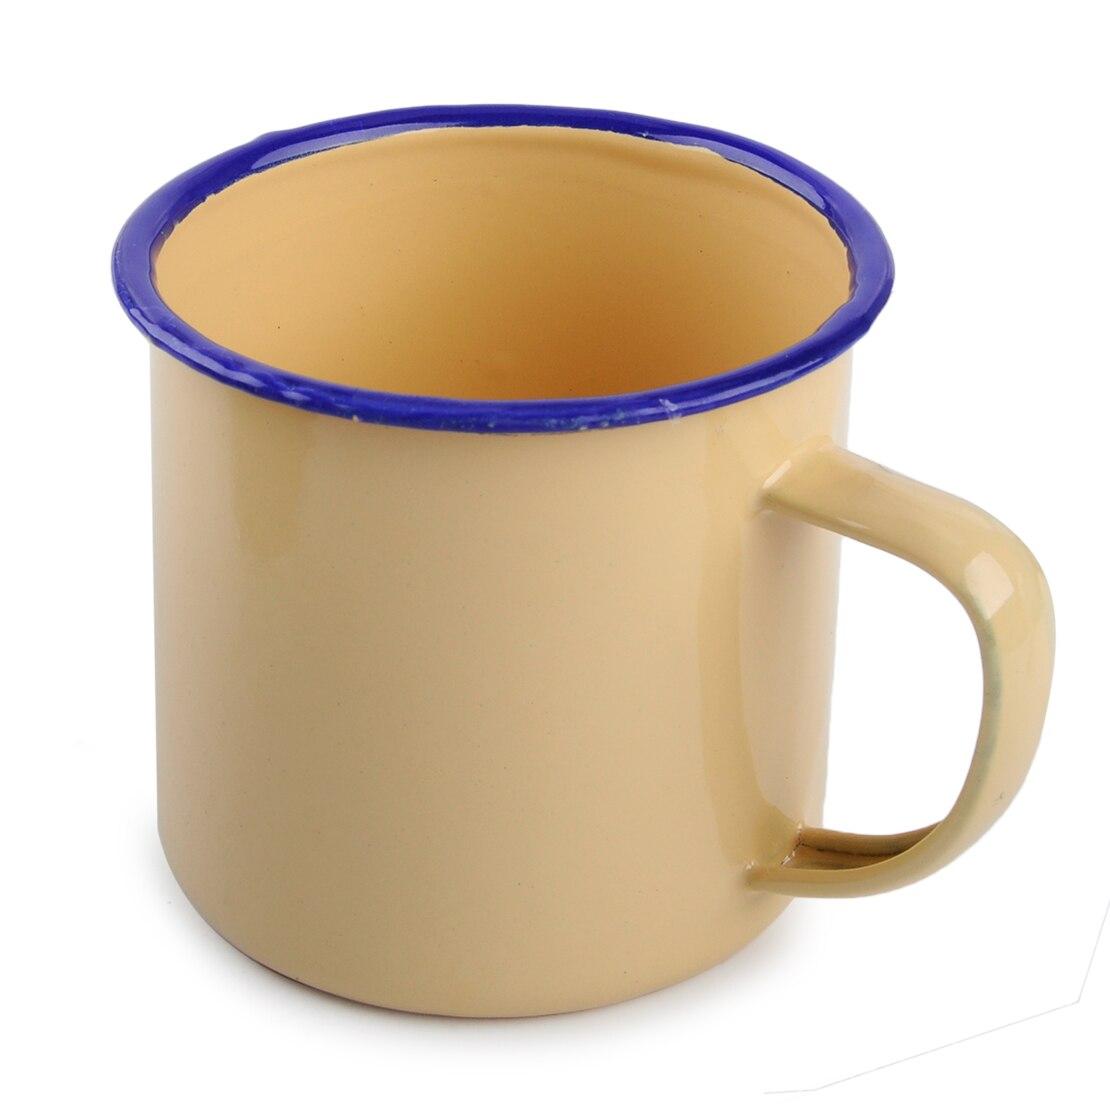 Vintage Style Enamel Cup Mug for Drinking Coffee Bear Tea Camping Hiking 300ml